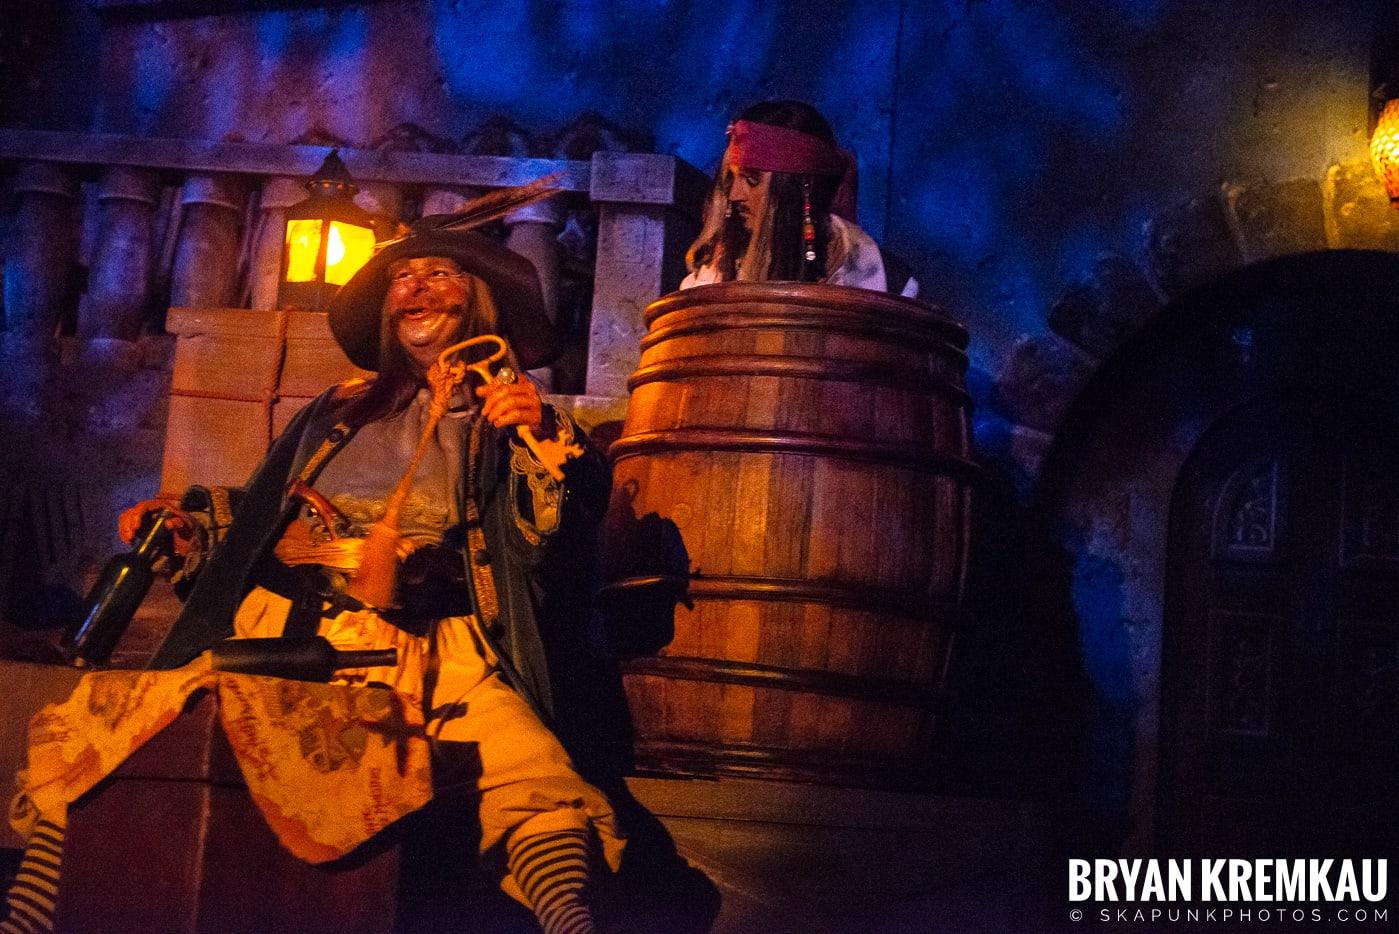 Walt Disney World Vacation: Days 1 & 2 (Disney Springs & Magic Kingdom, Epcot) September 29th - 30th 2019 (7)